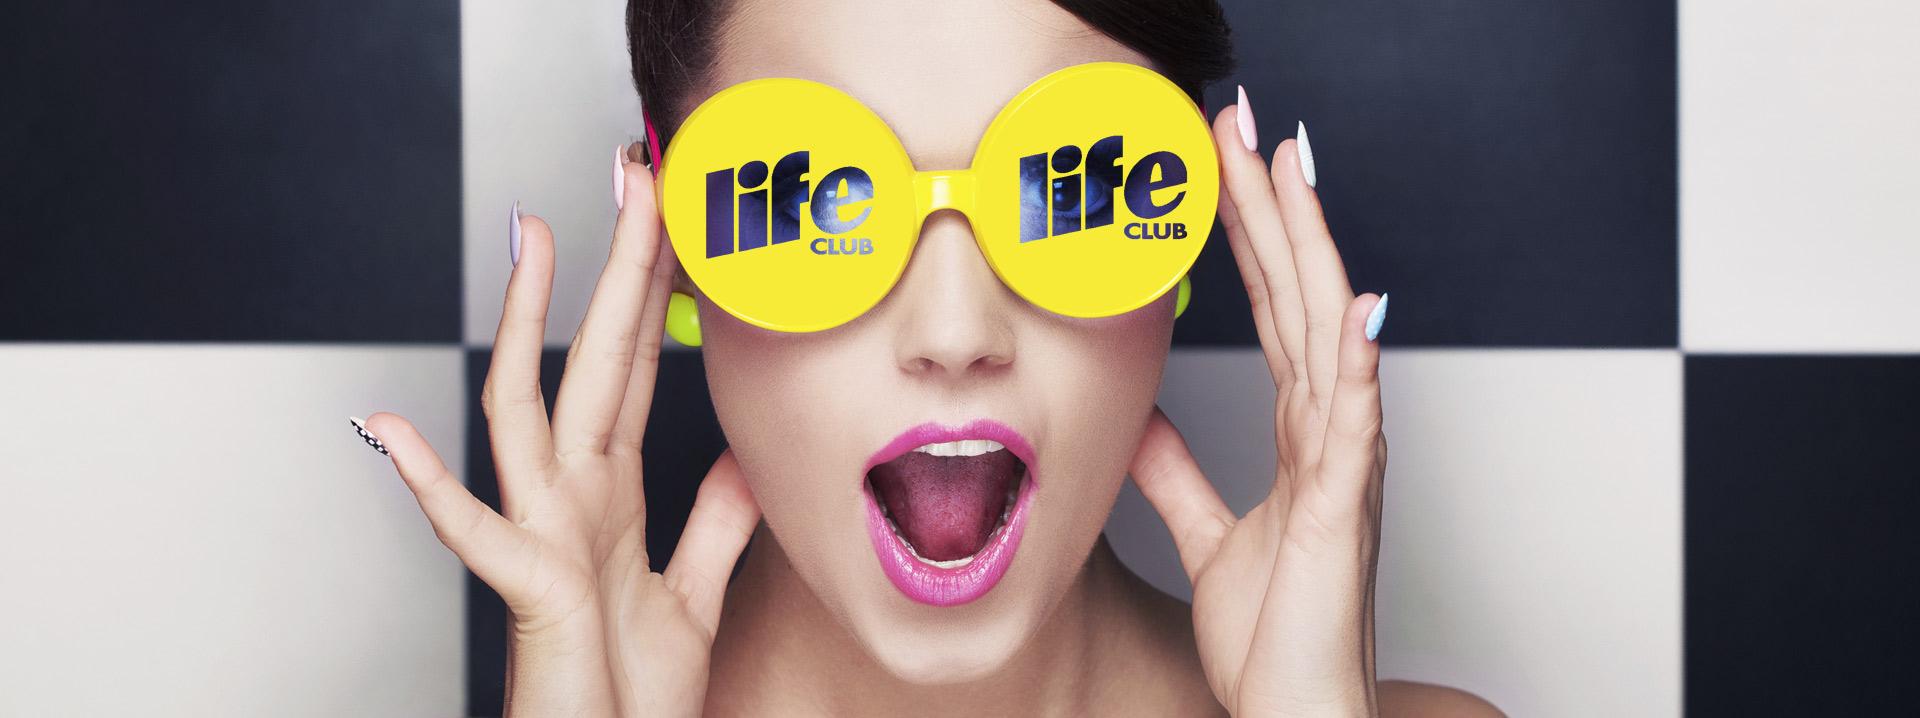 Life Club Disco